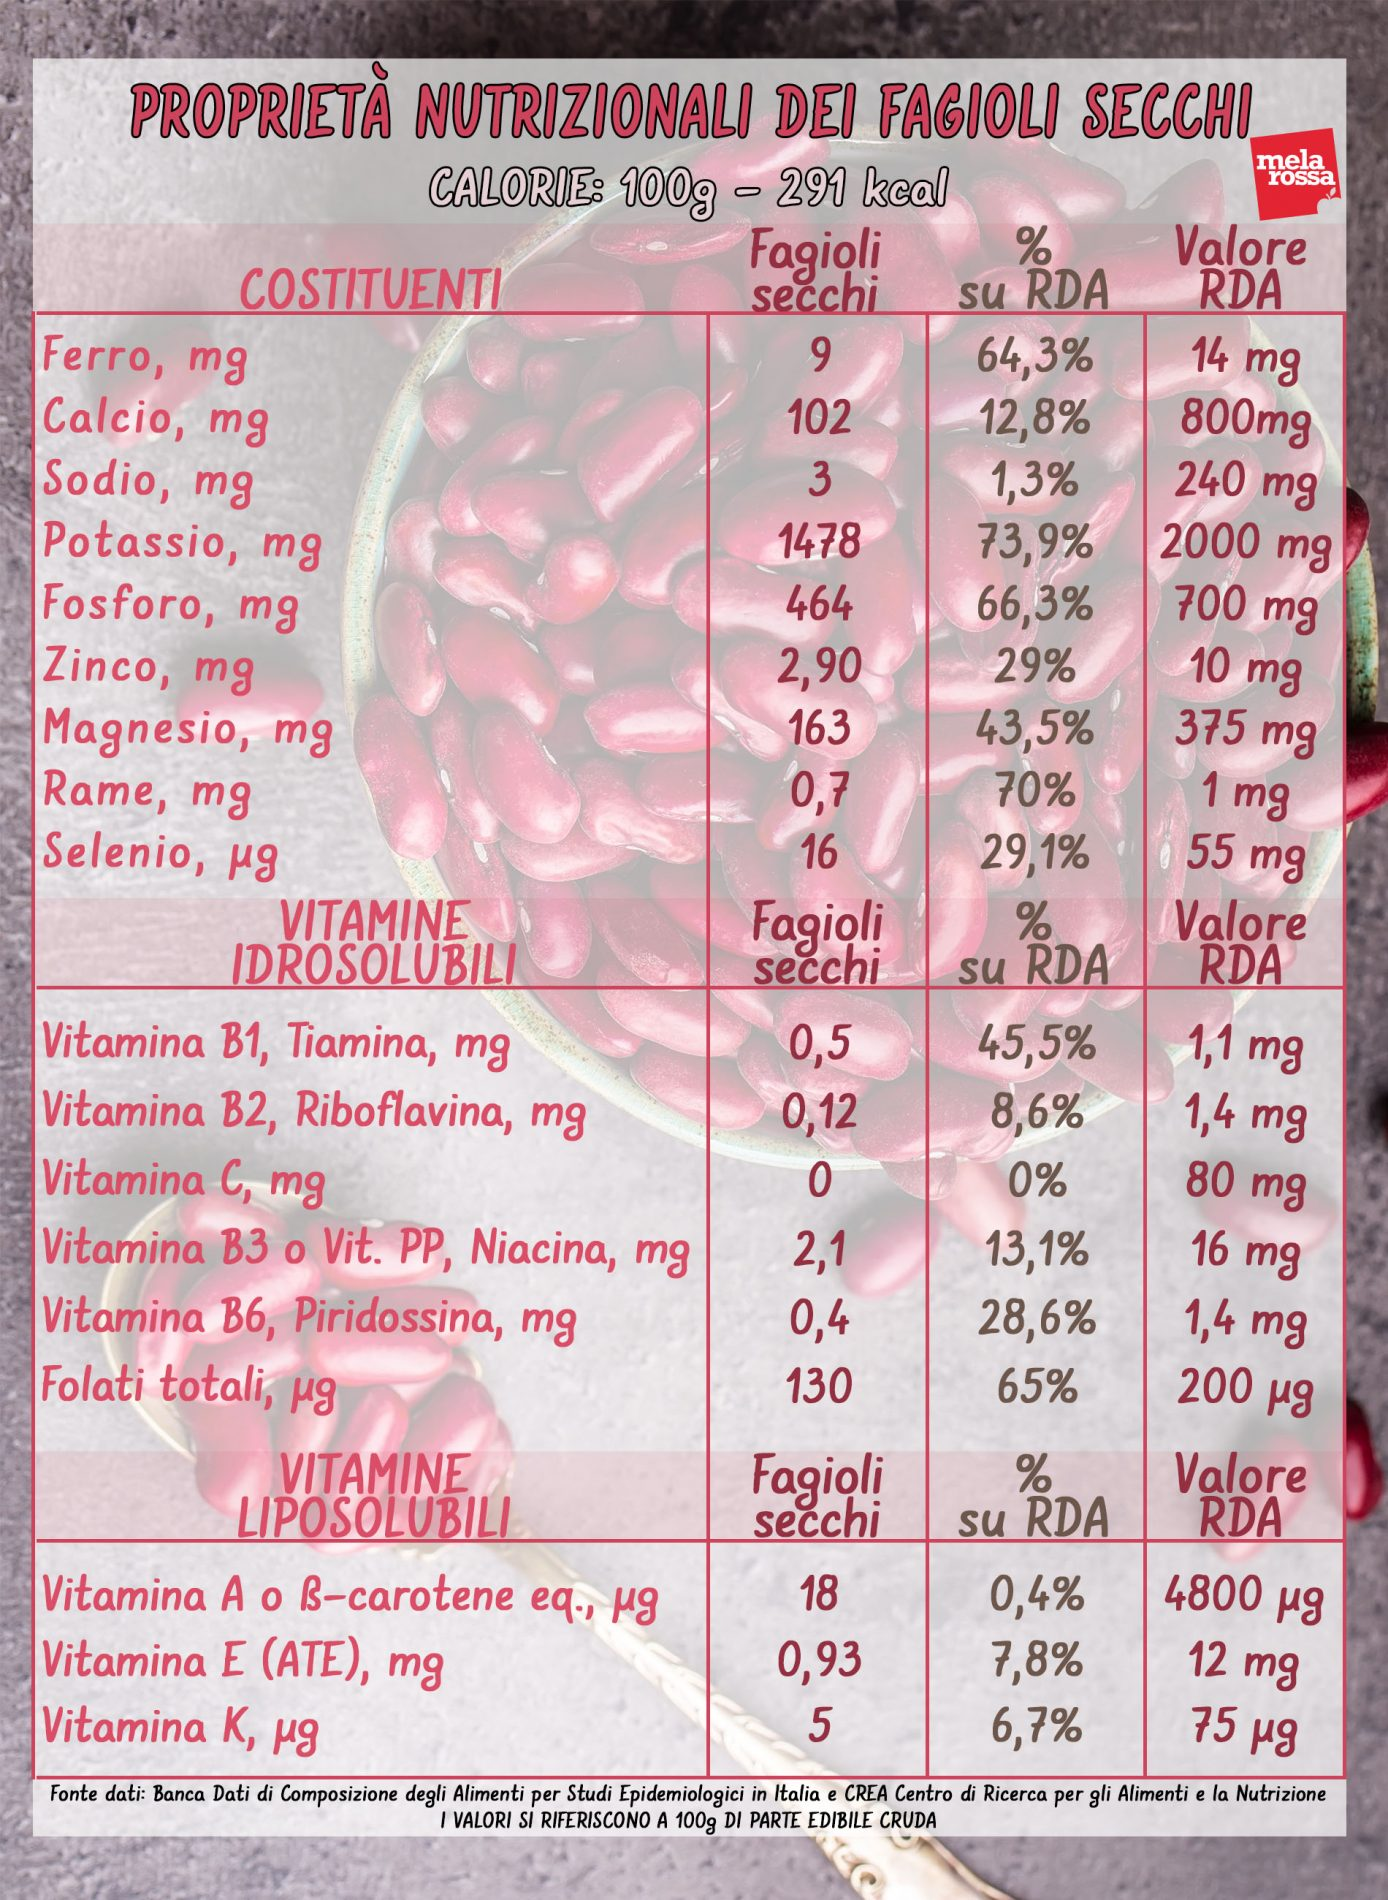 Valori nutrizionali dei fagioli